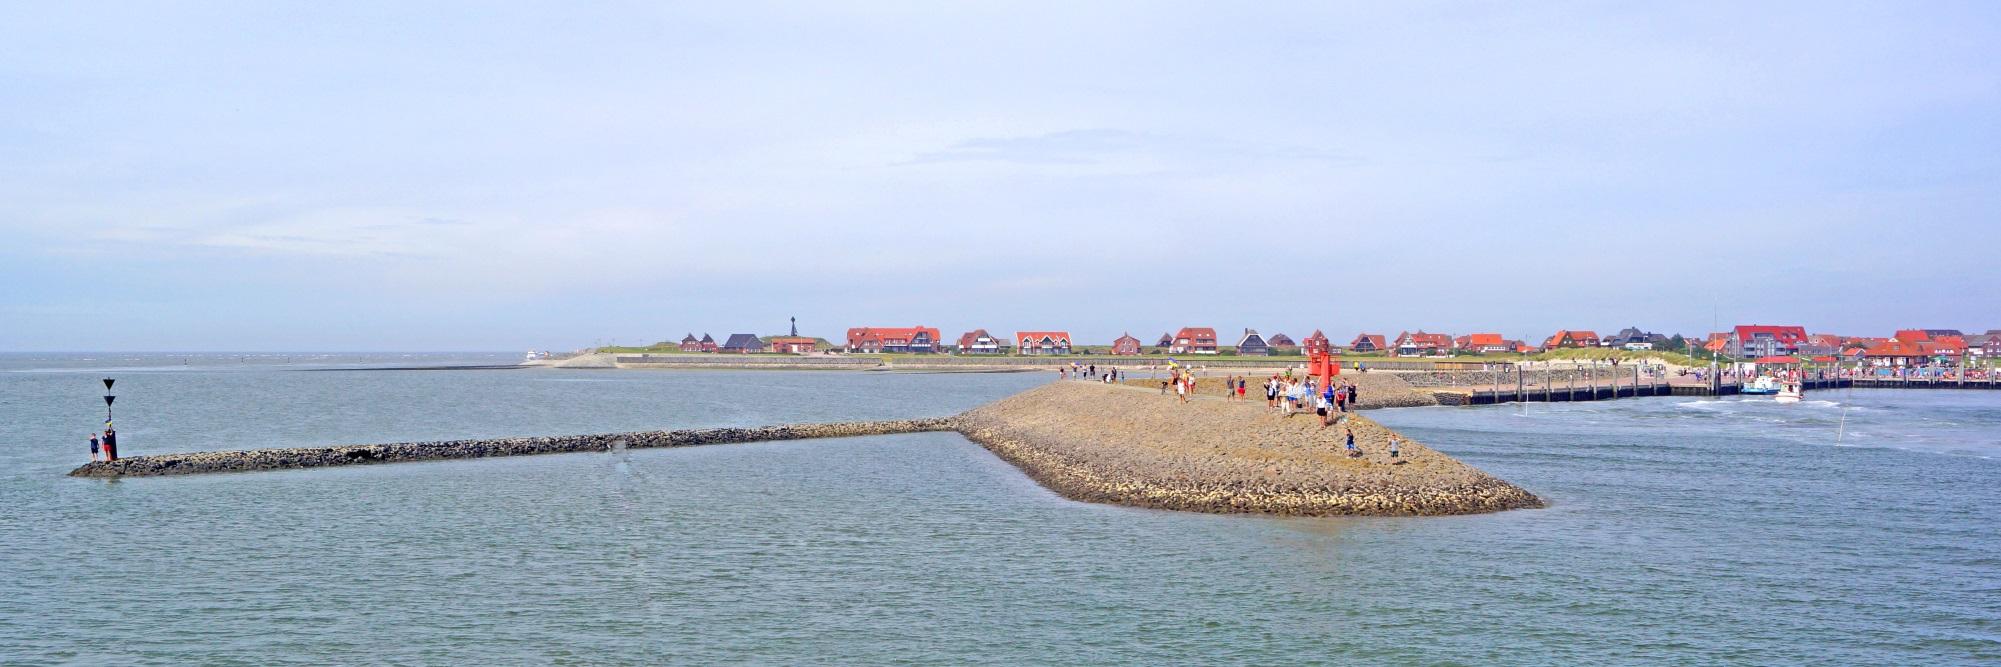 Baltrum Panorama Inselorte